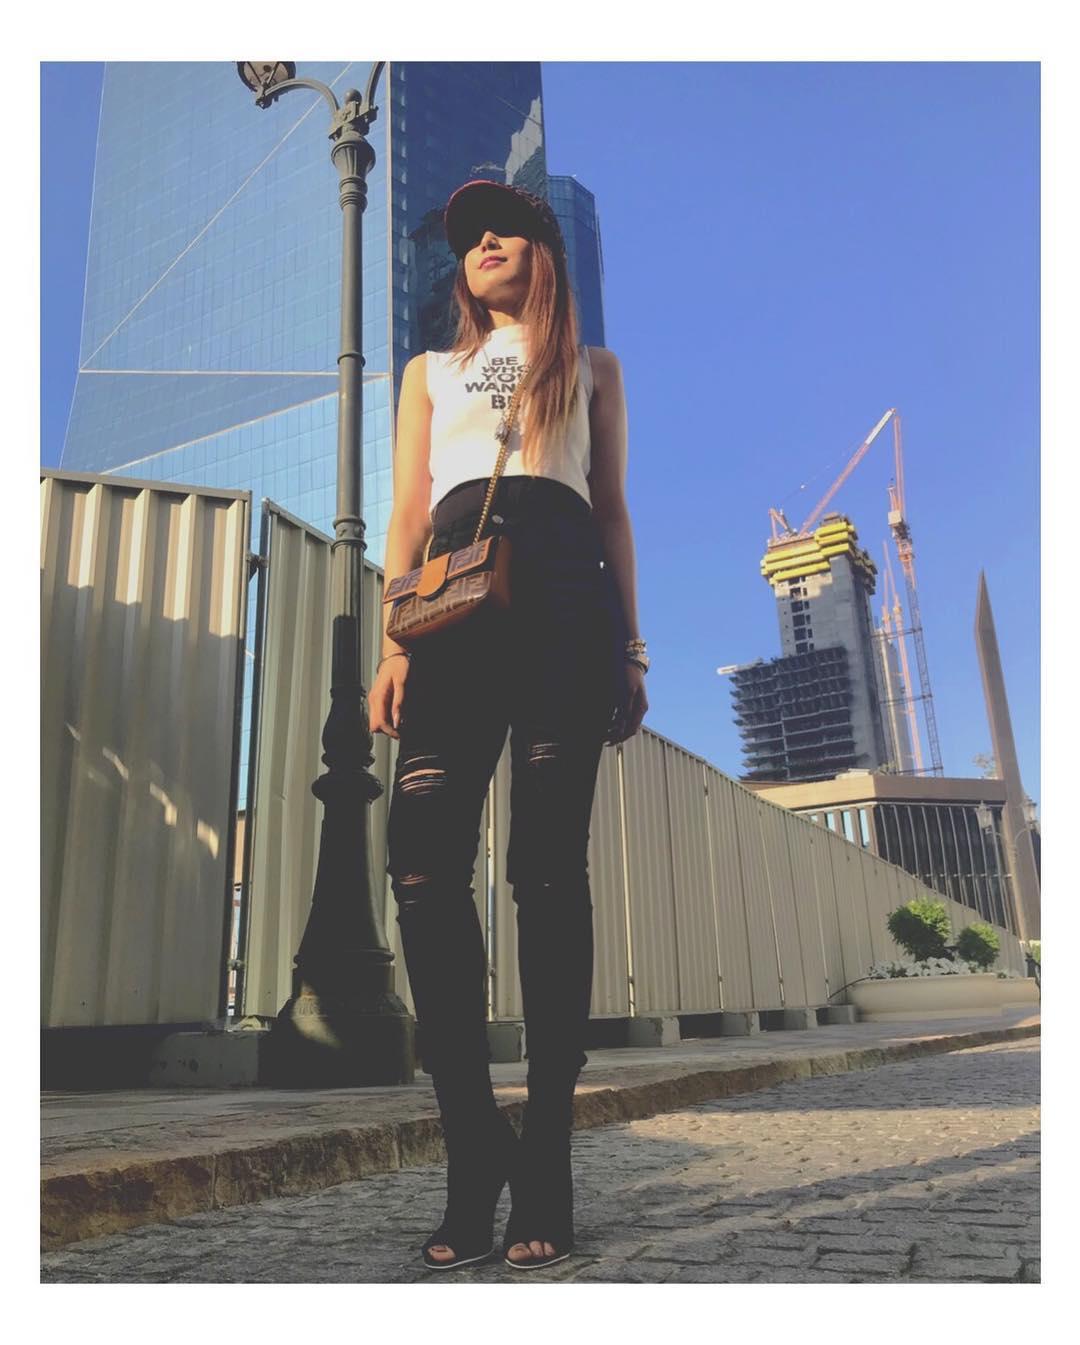 New Photos of Aima Baig in Dubai and USA